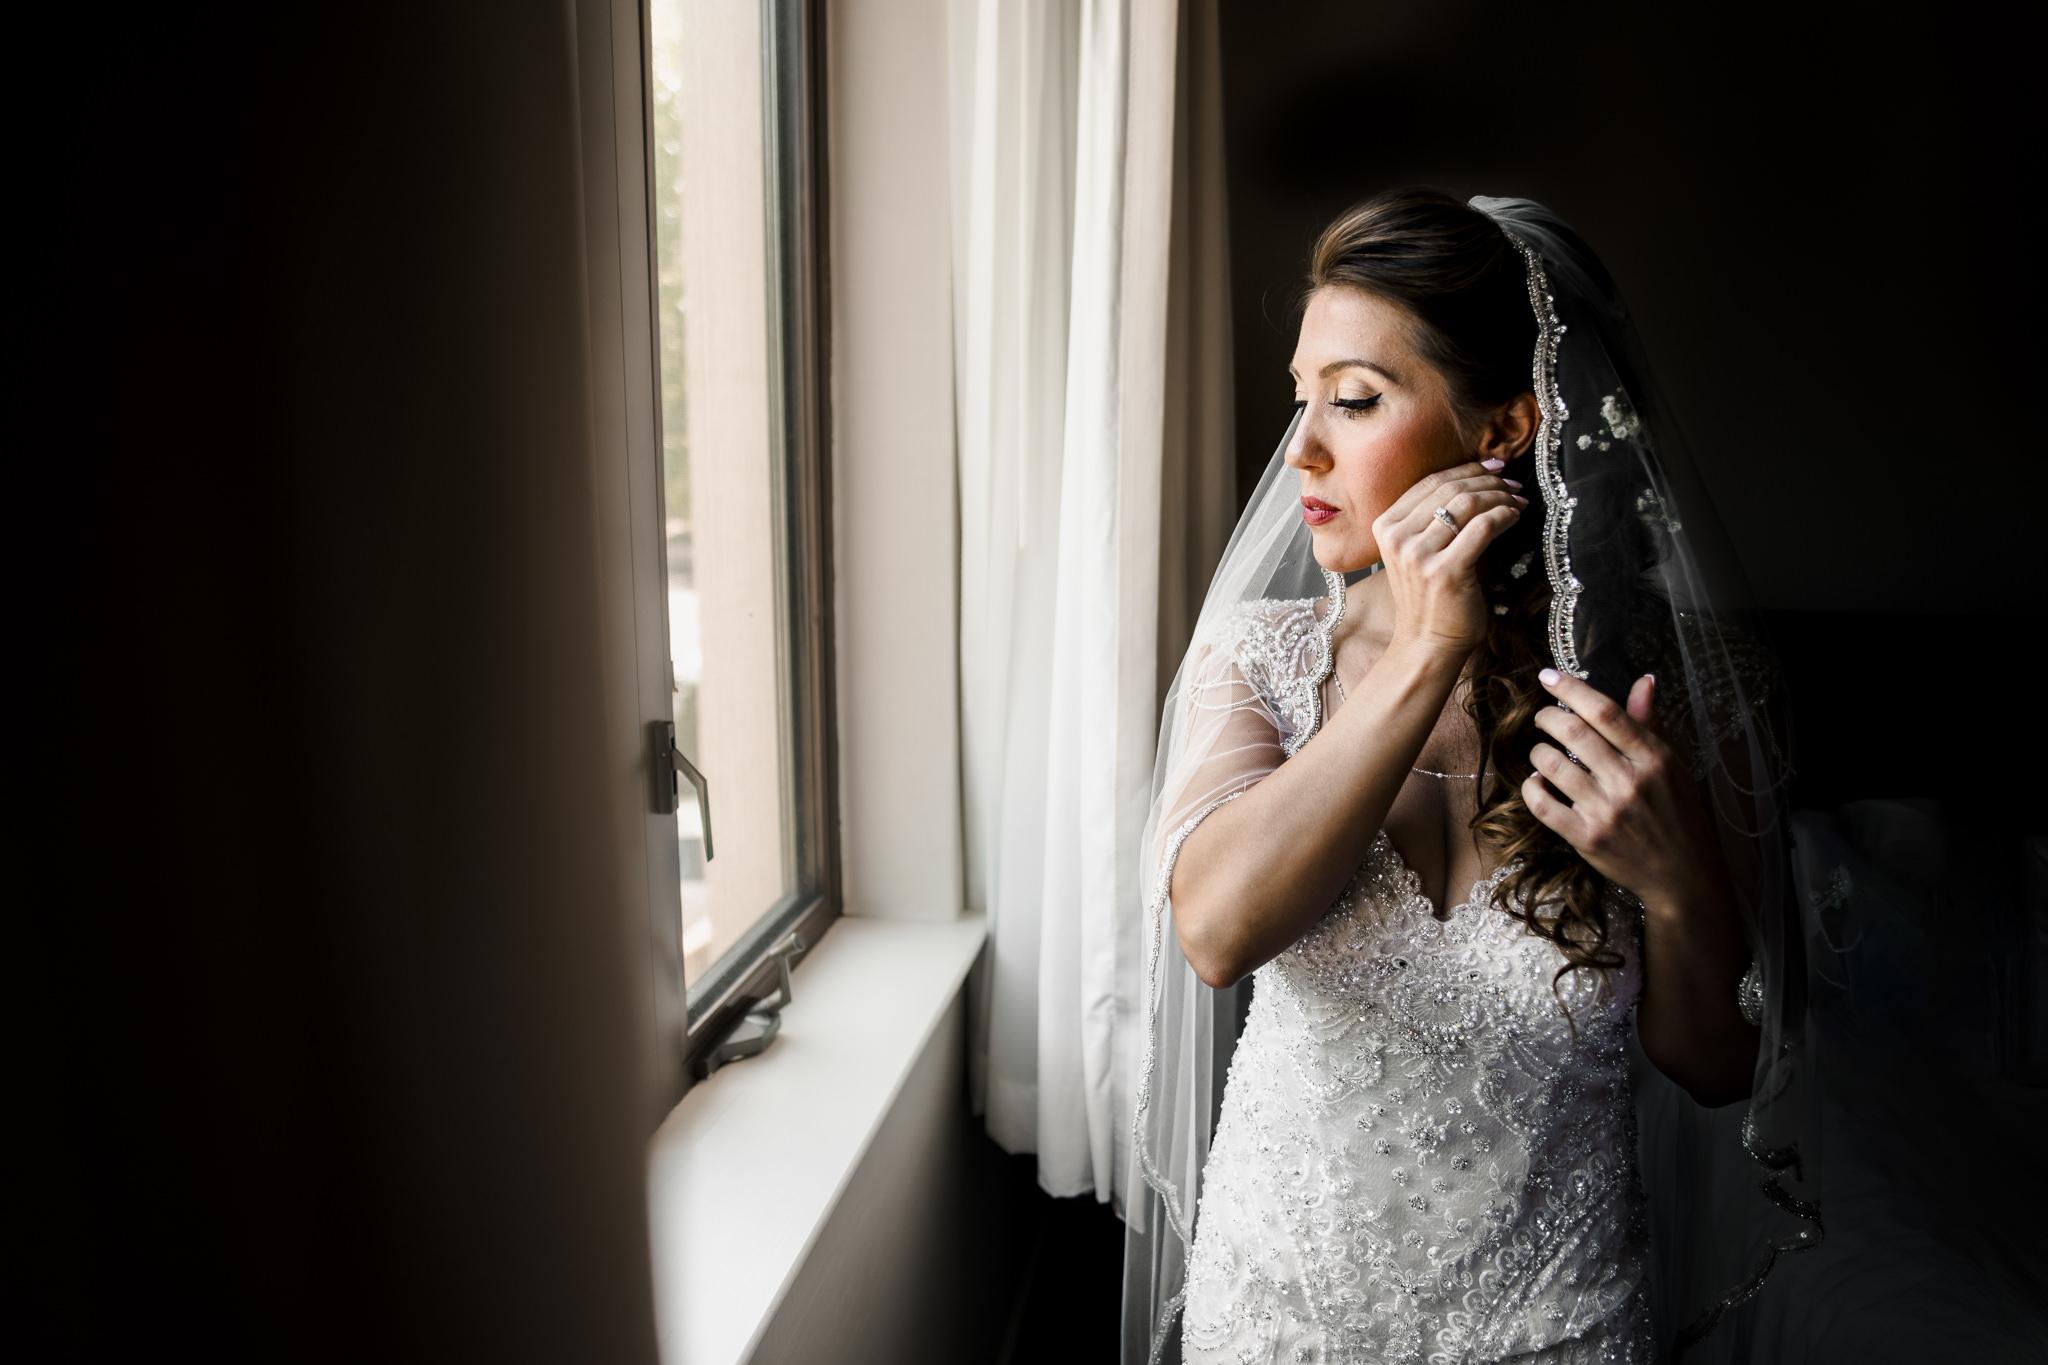 Barbato-Moorestown-Community-House-Wedding-New-Jersey-Photographer-03.JPG